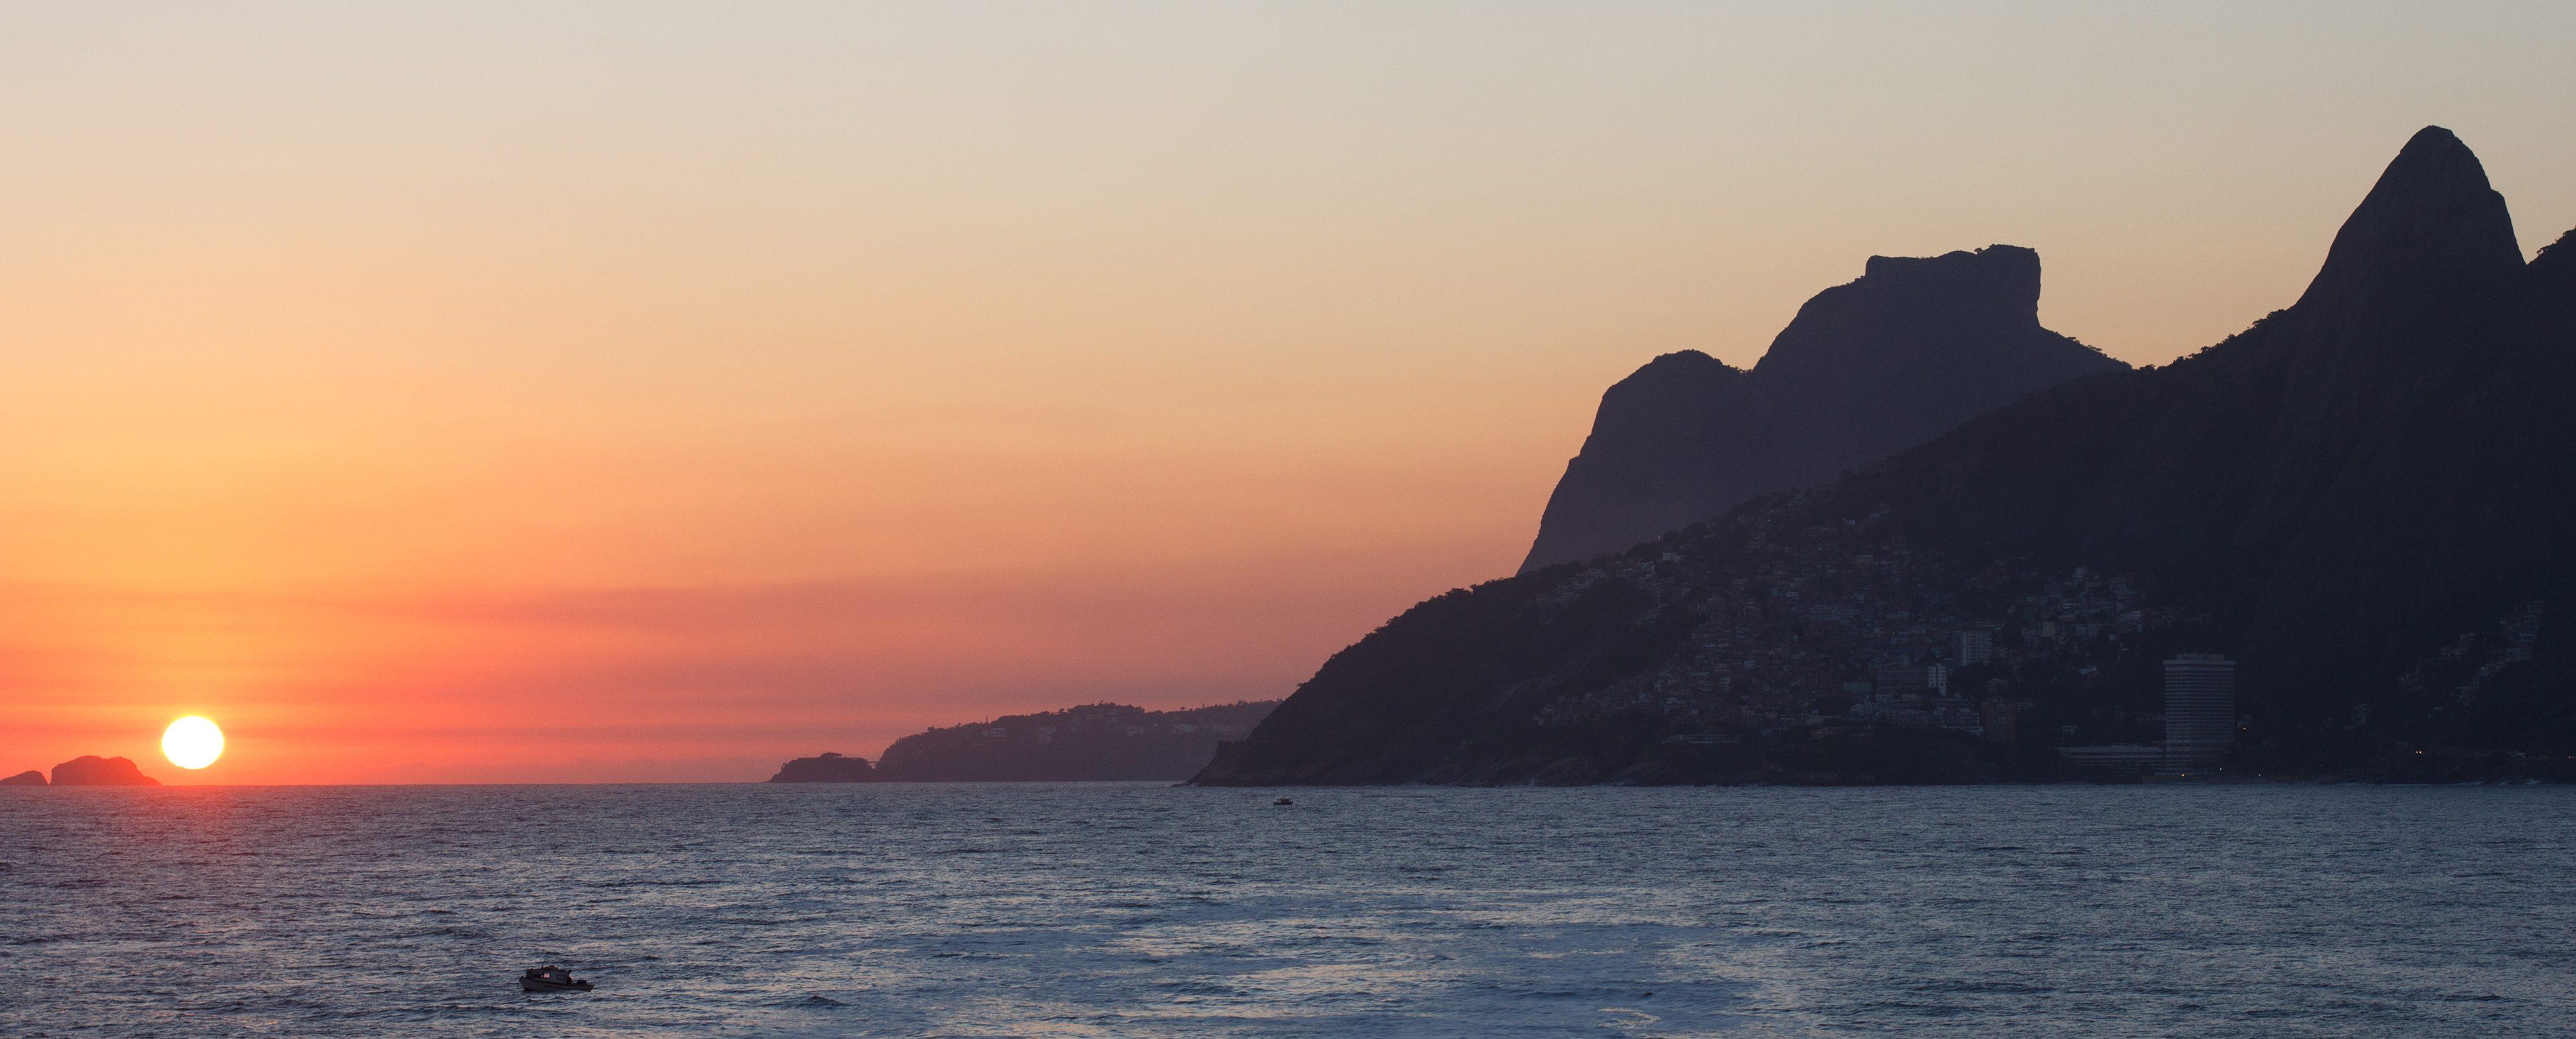 Sunset at Ipanema beach in Rio de Janeiro.